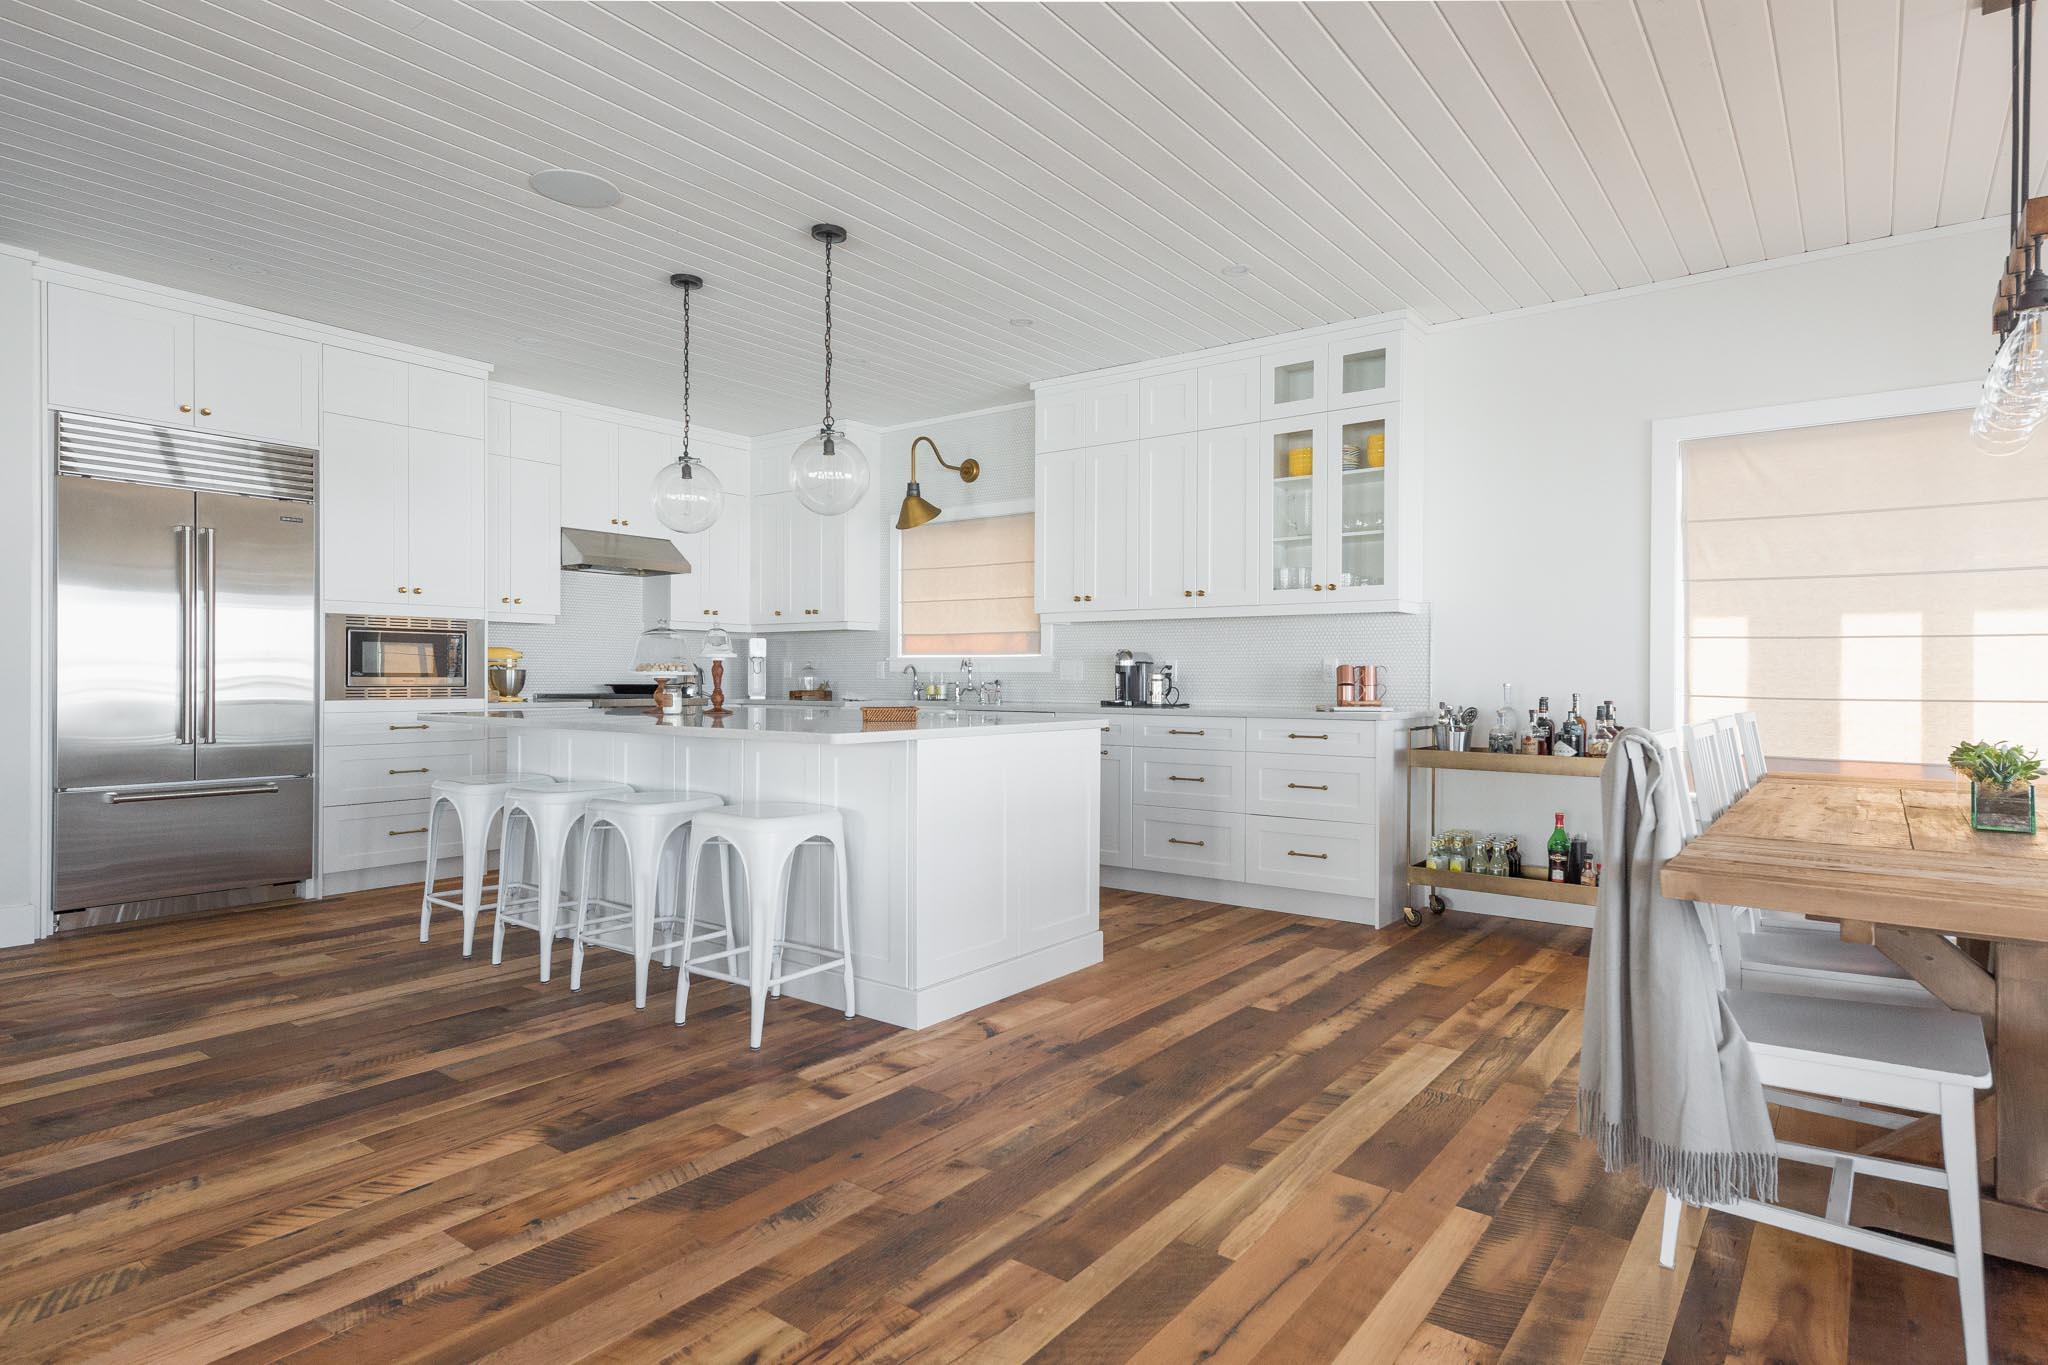 Web Res (For Social) Wabamun Cottage Floors-54.jpg